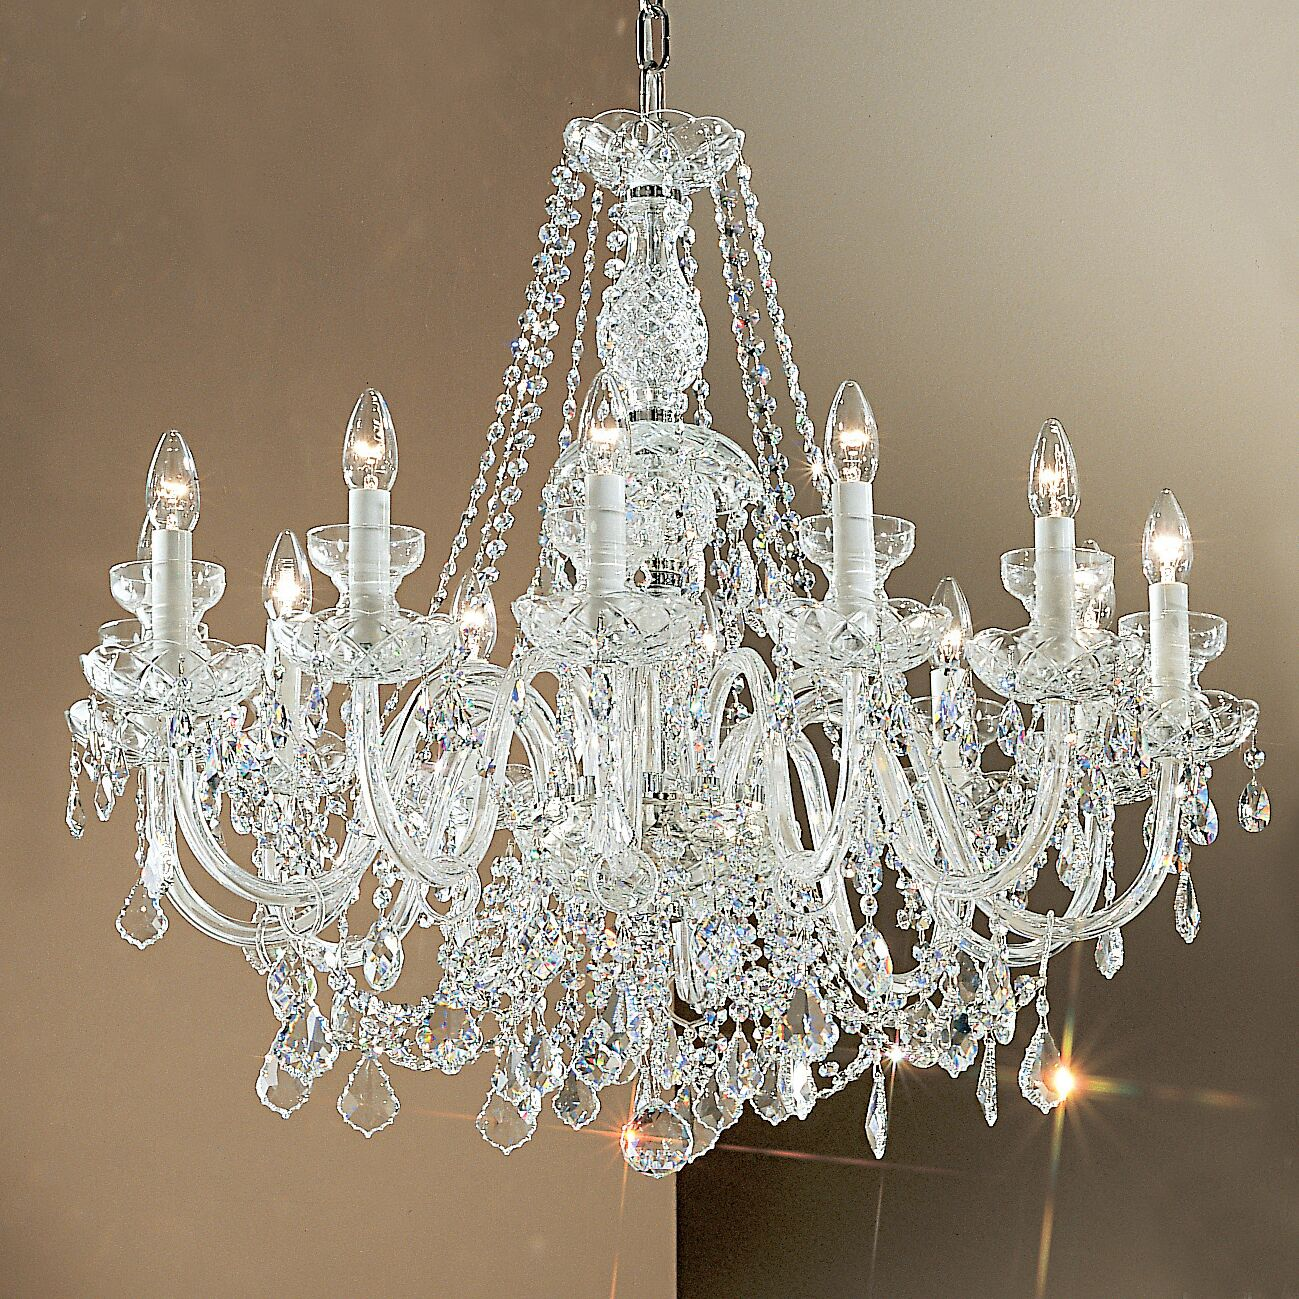 Bohemia 12-Light Candle Style Chandelier Crystal Type: Swarovski Spectra, Finish: 24K Gold Plate